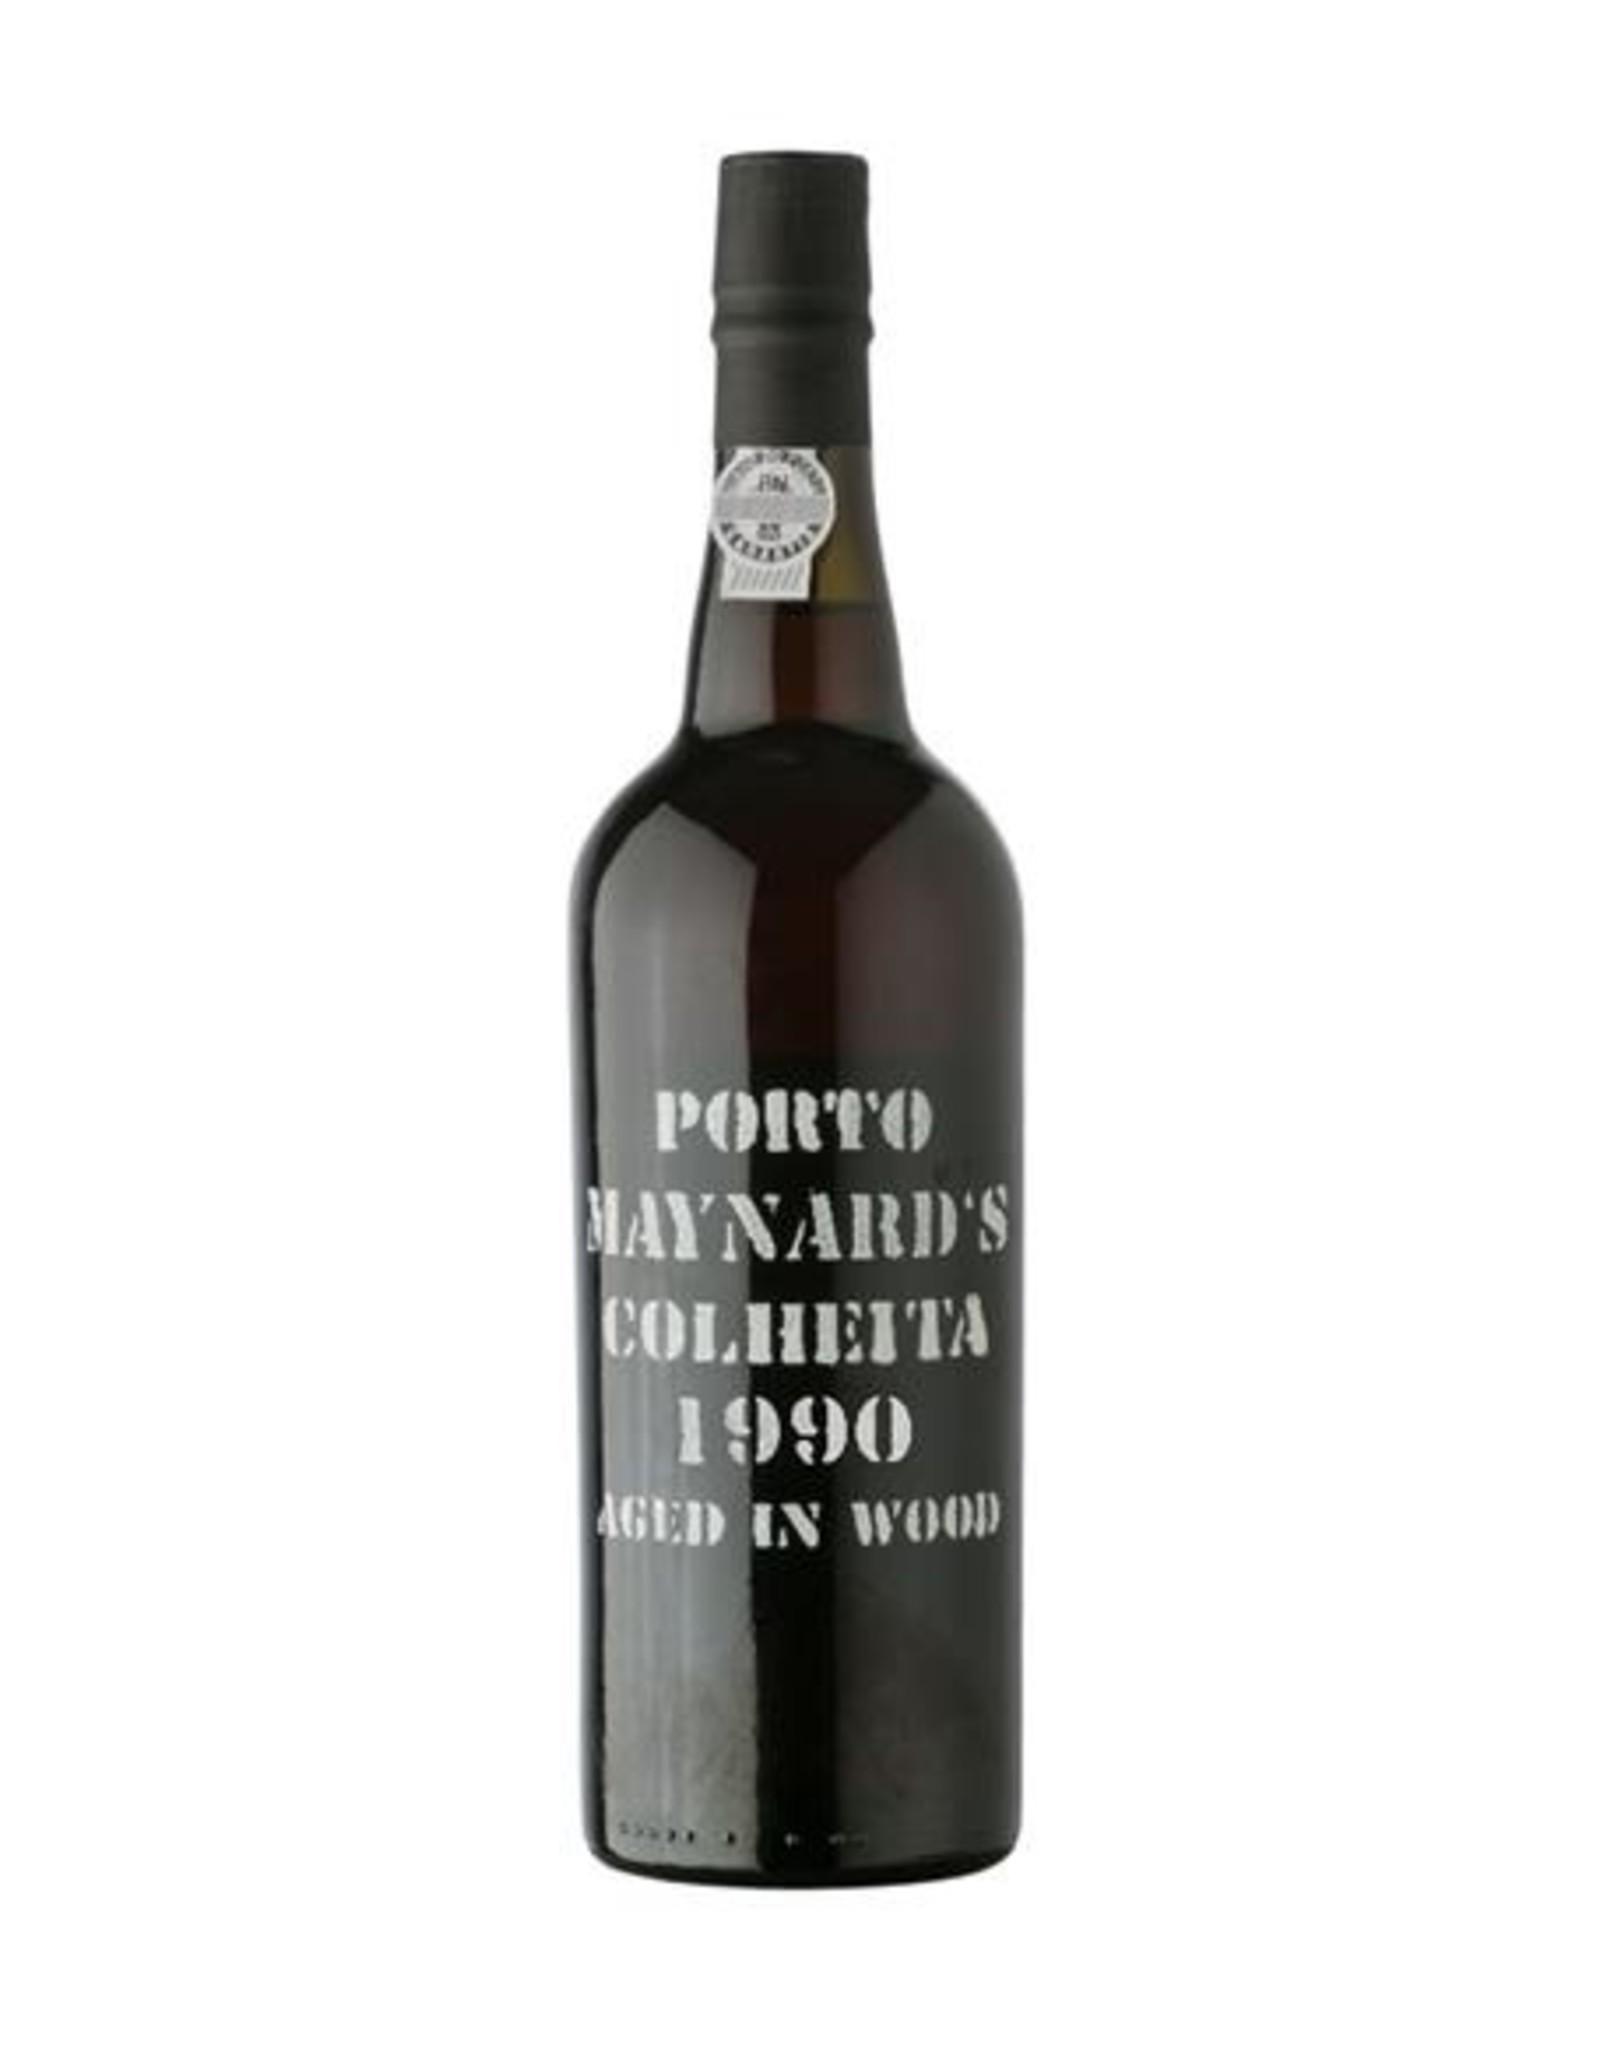 Maynard's Port Maynard's Tawny Colheita 1990 75 cl